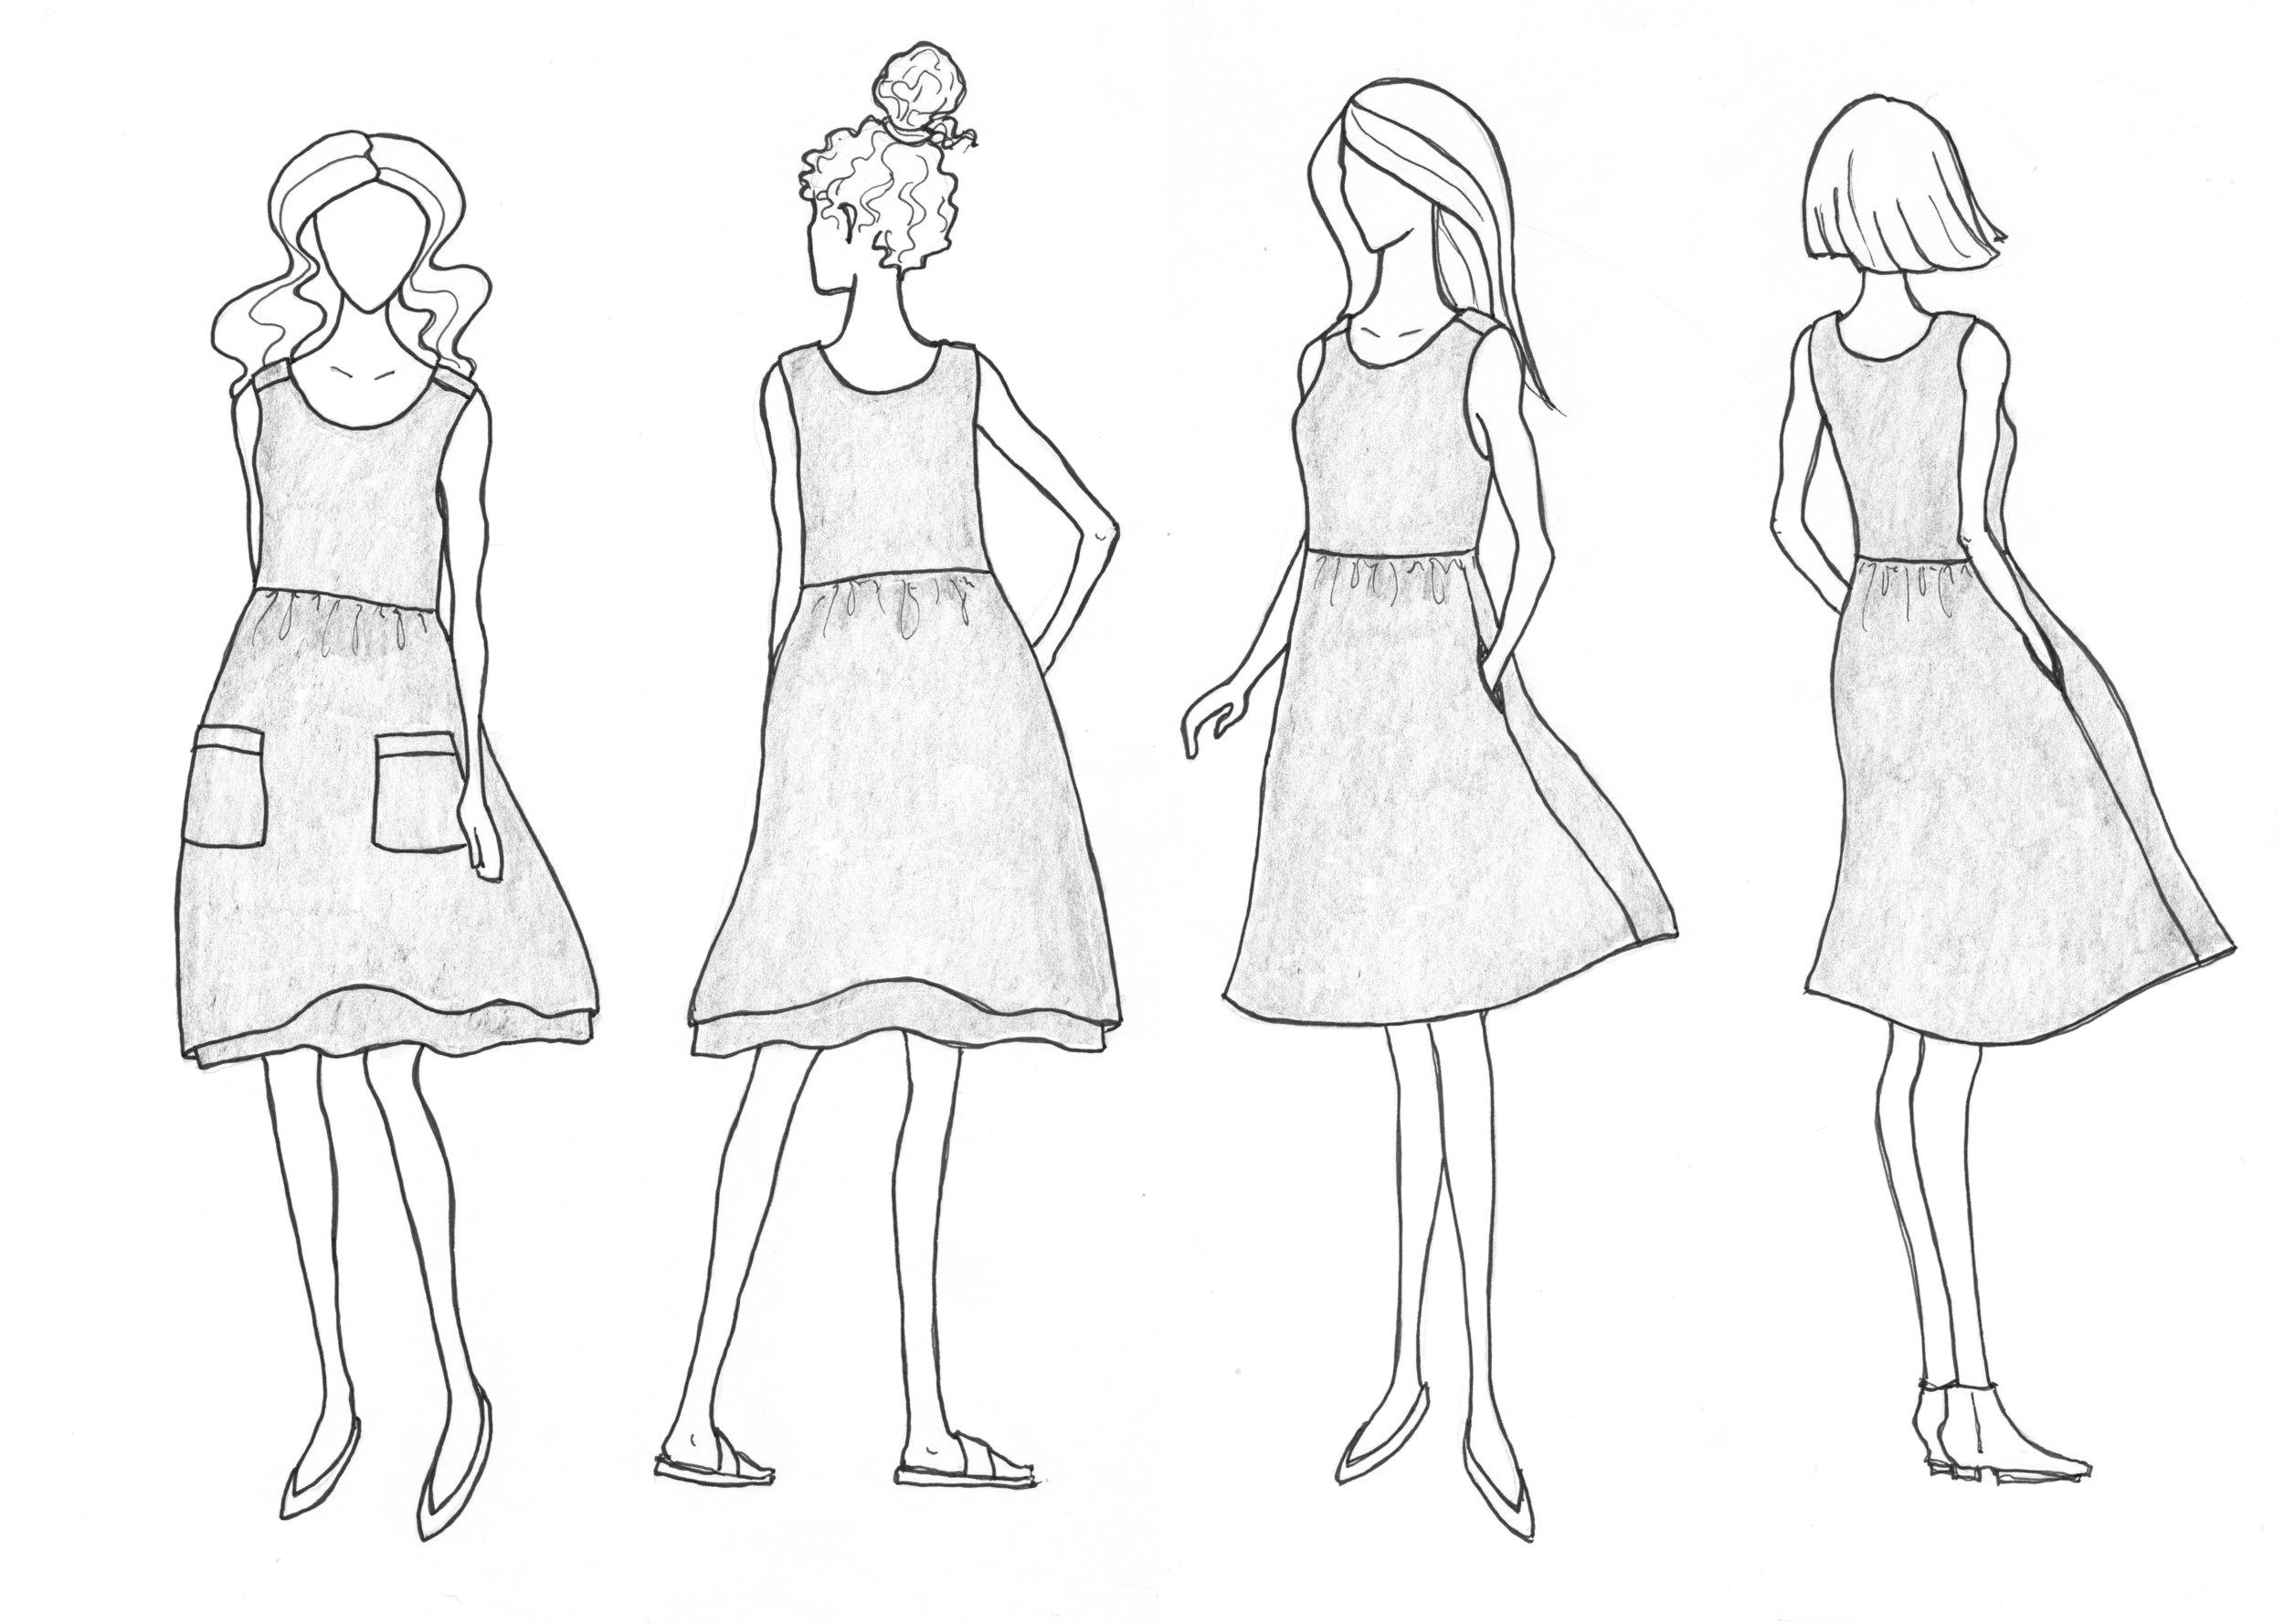 Metamorphic dress - The Foldline